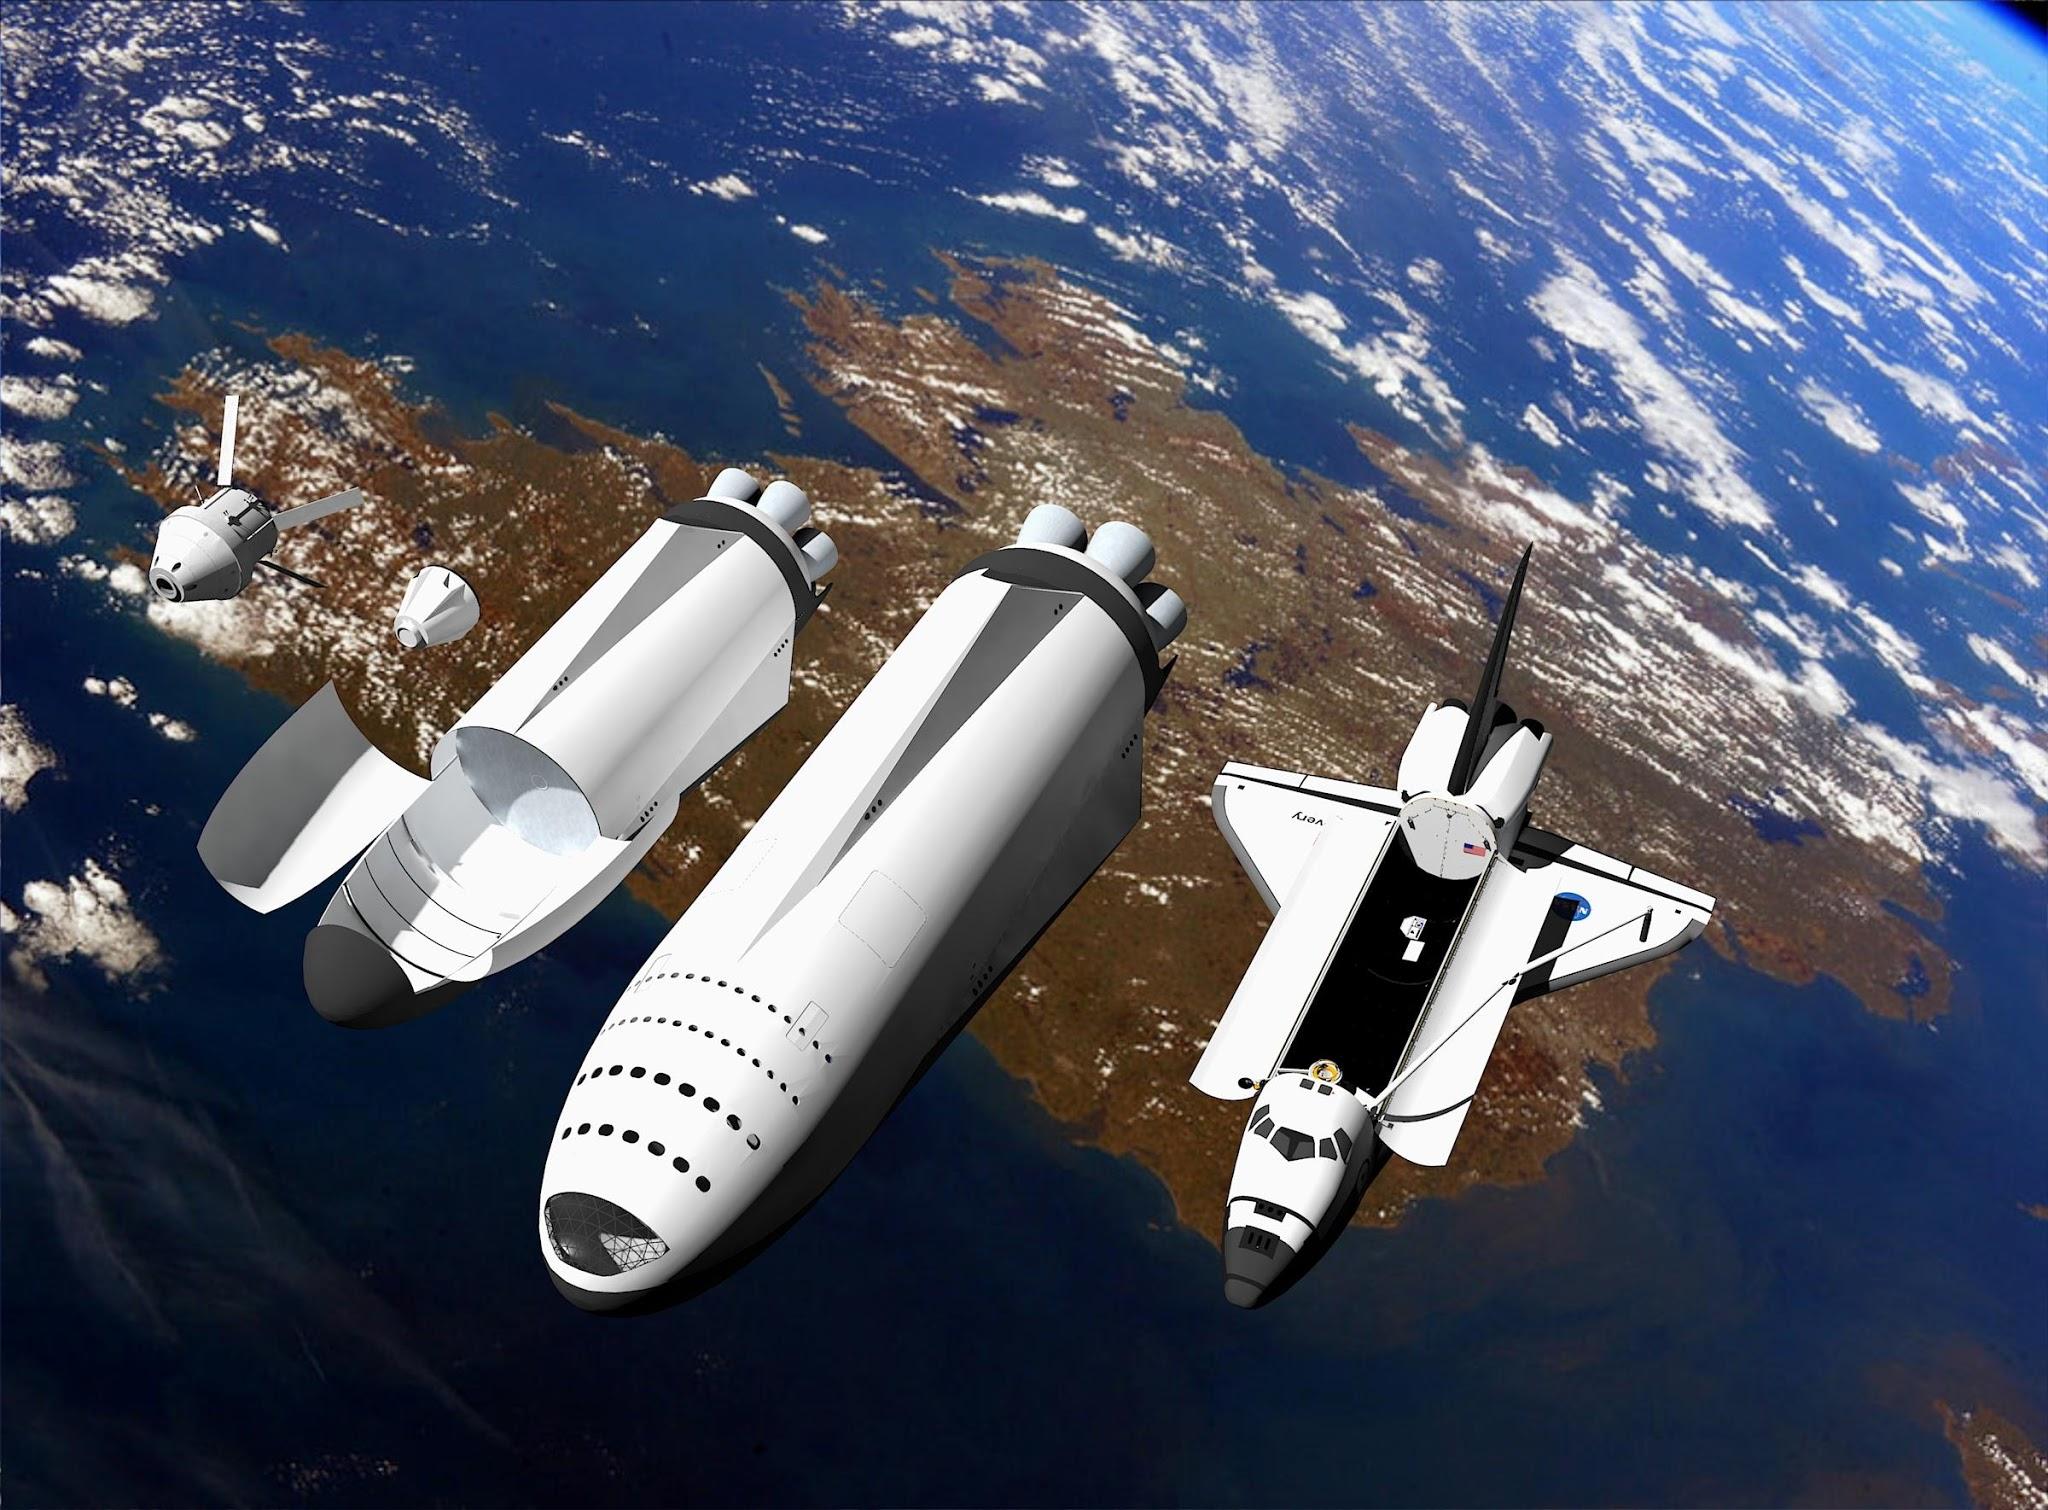 spacex vs orbital - photo #12